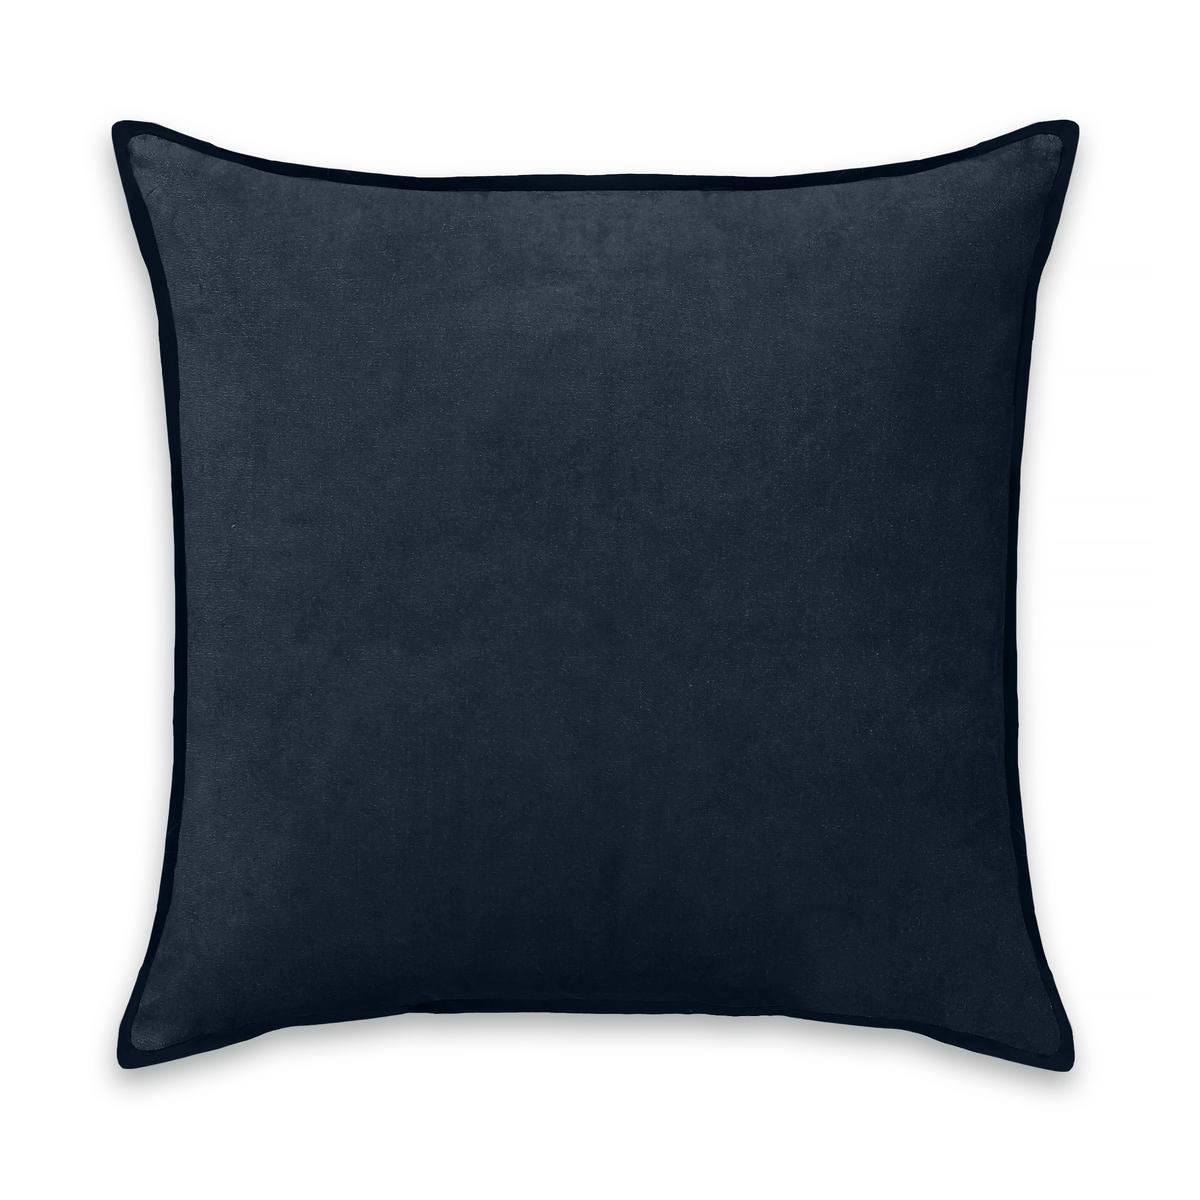 Фото - Чехол на подушку-валик из велюра, Vélivole чехол на подушку валик tasuna